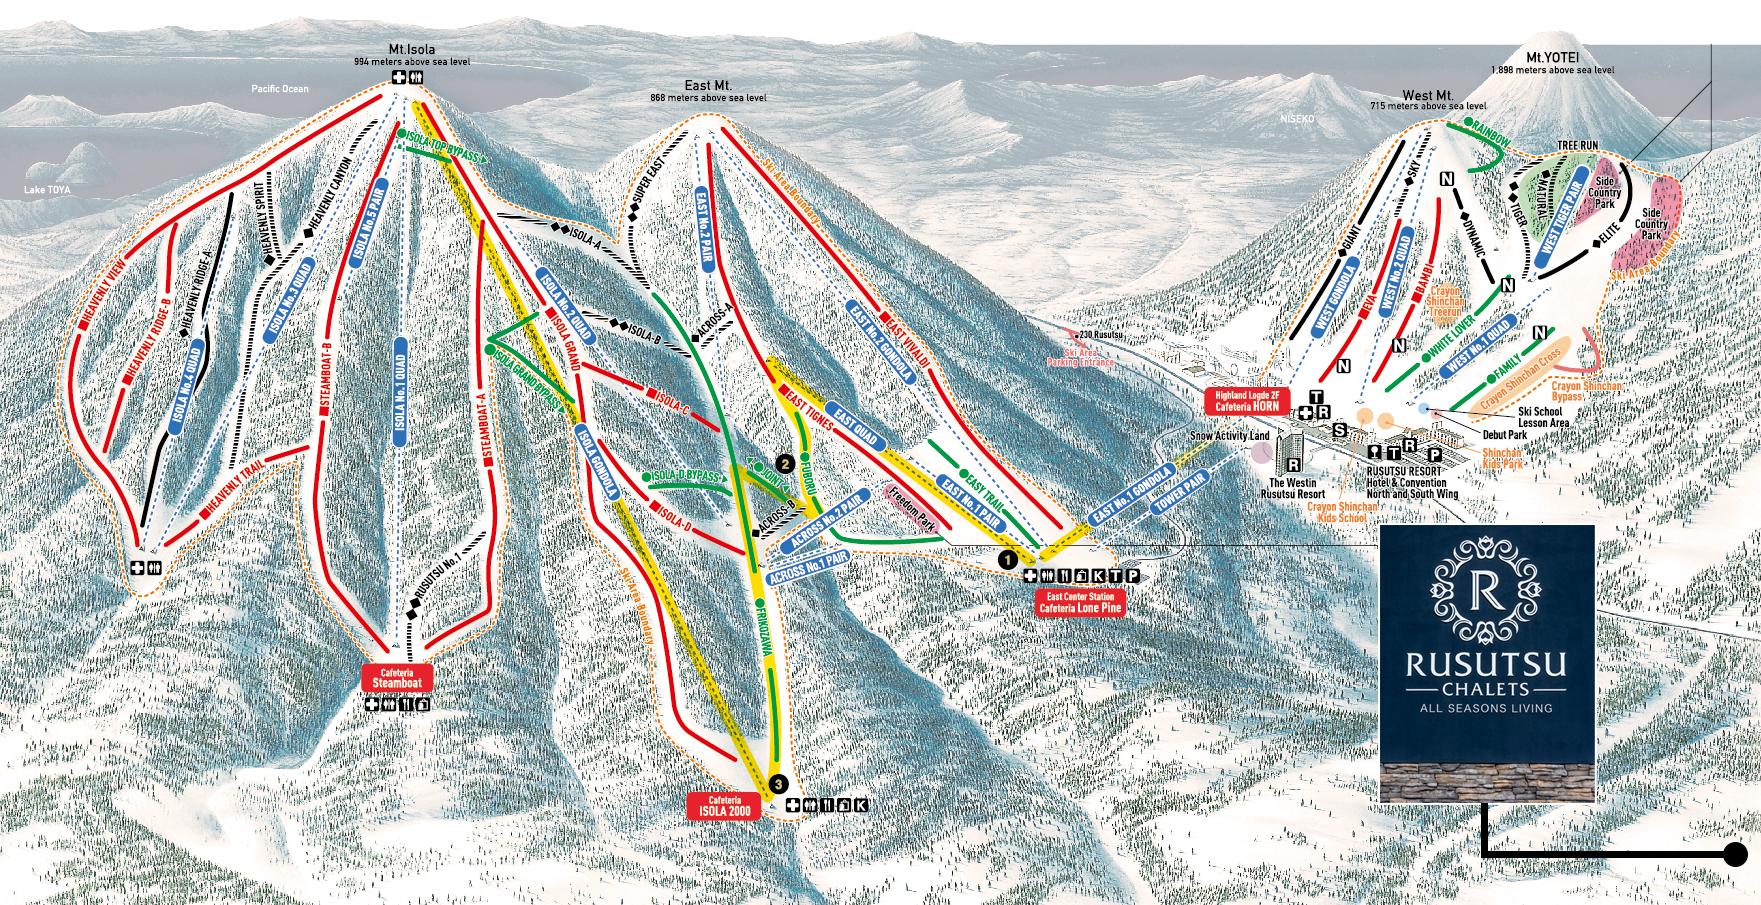 Distance to ski lifts